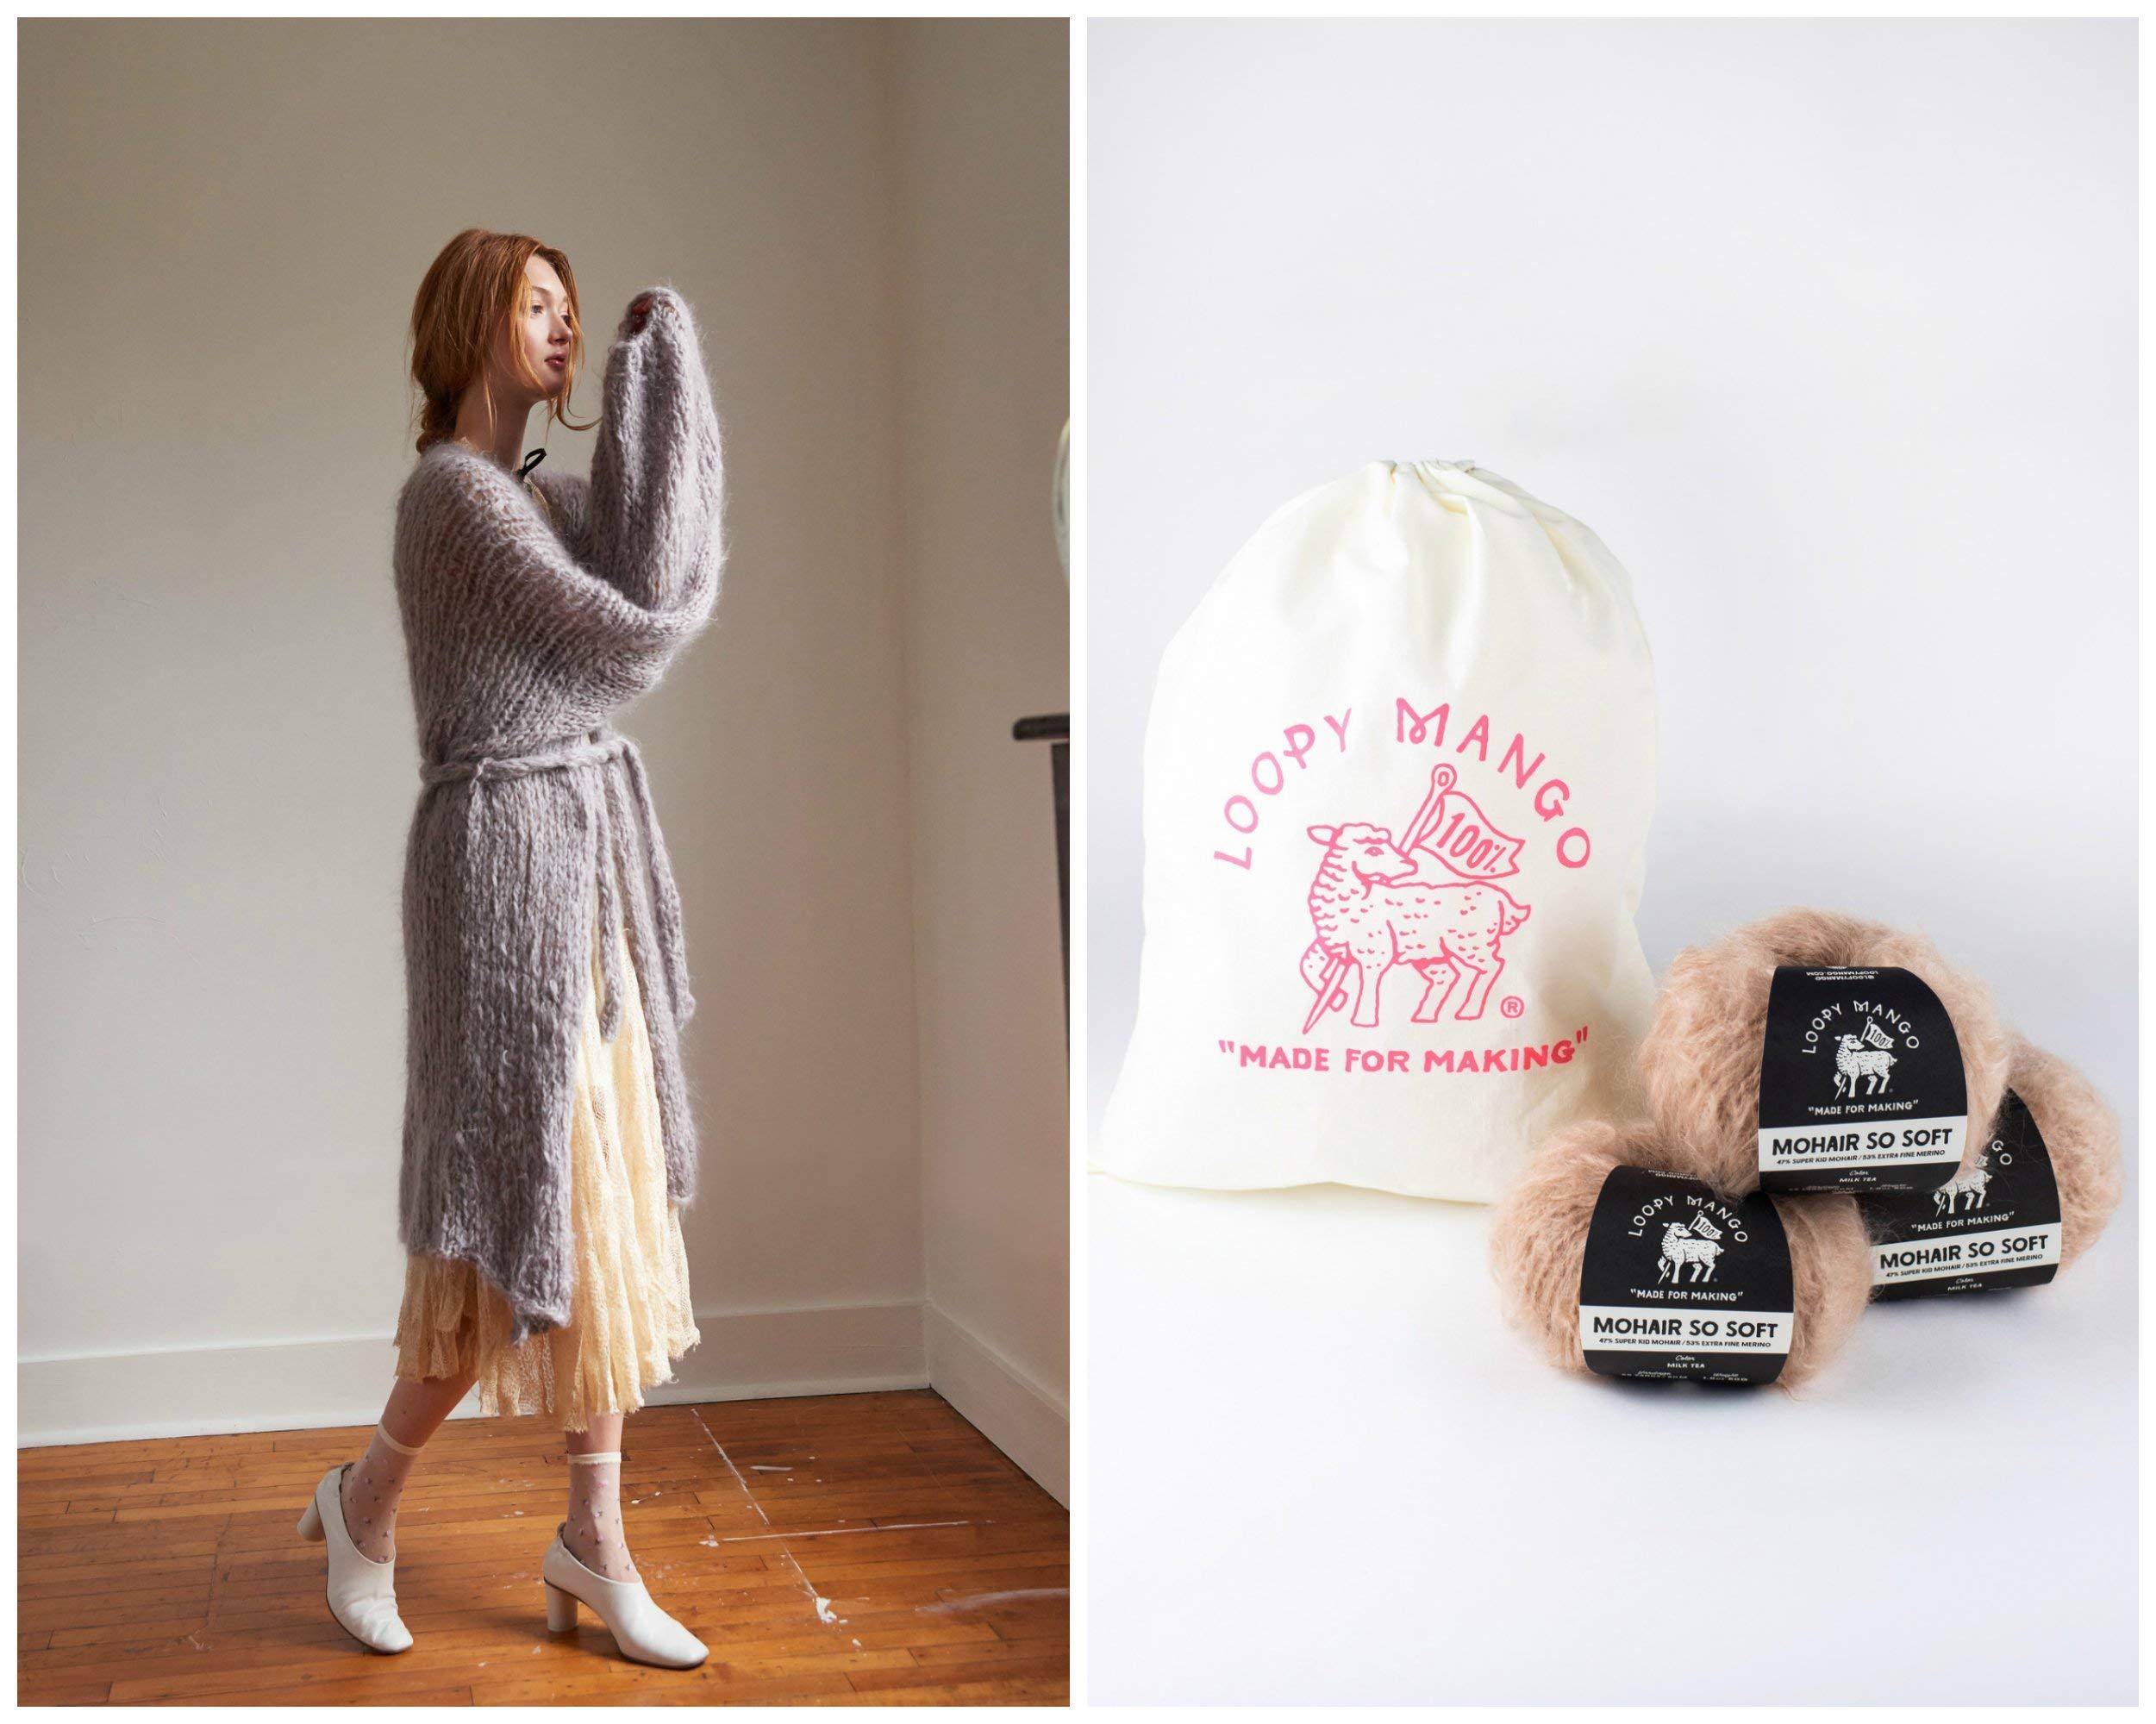 Loopy Mango DIY Knit Kit - Medium/Large Long Cardigan - Mohair So Soft (Moss) by Loopy Mango (Image #1)